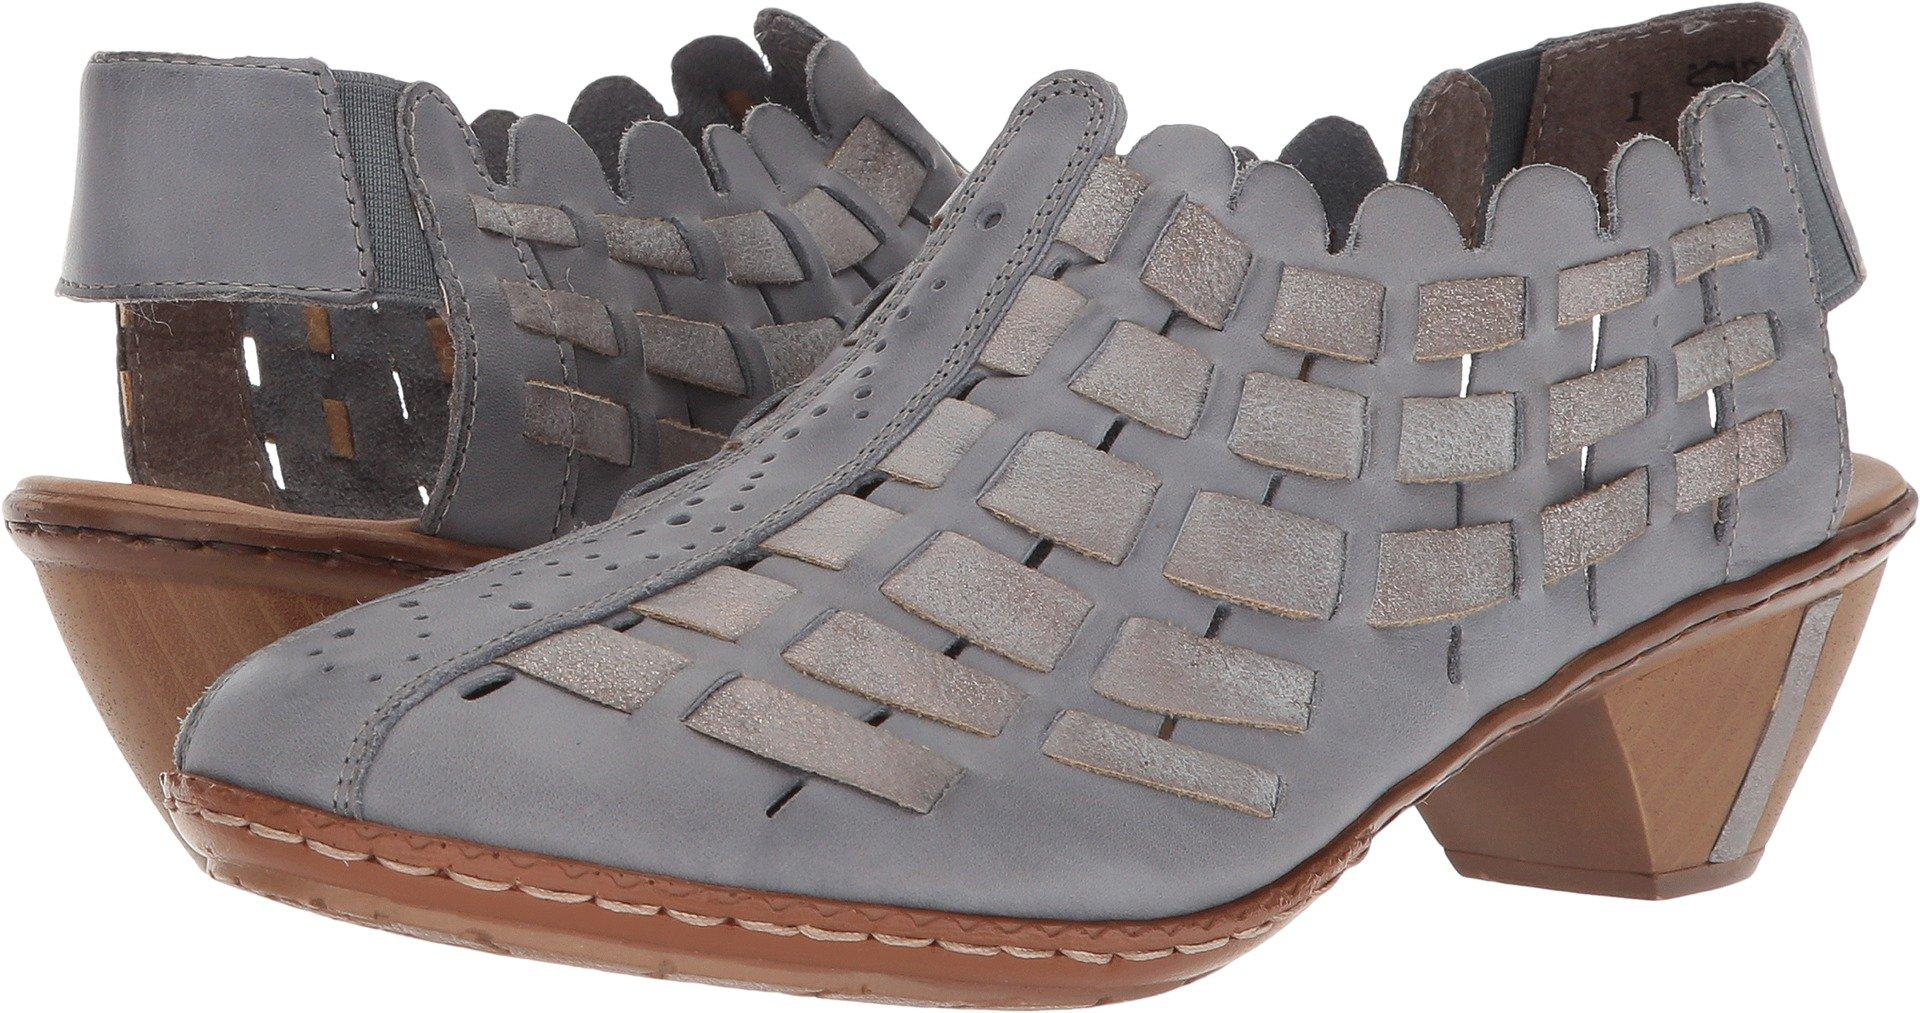 Rieker Women's 46778 Sina 78 Azur/Grey 36 M EU